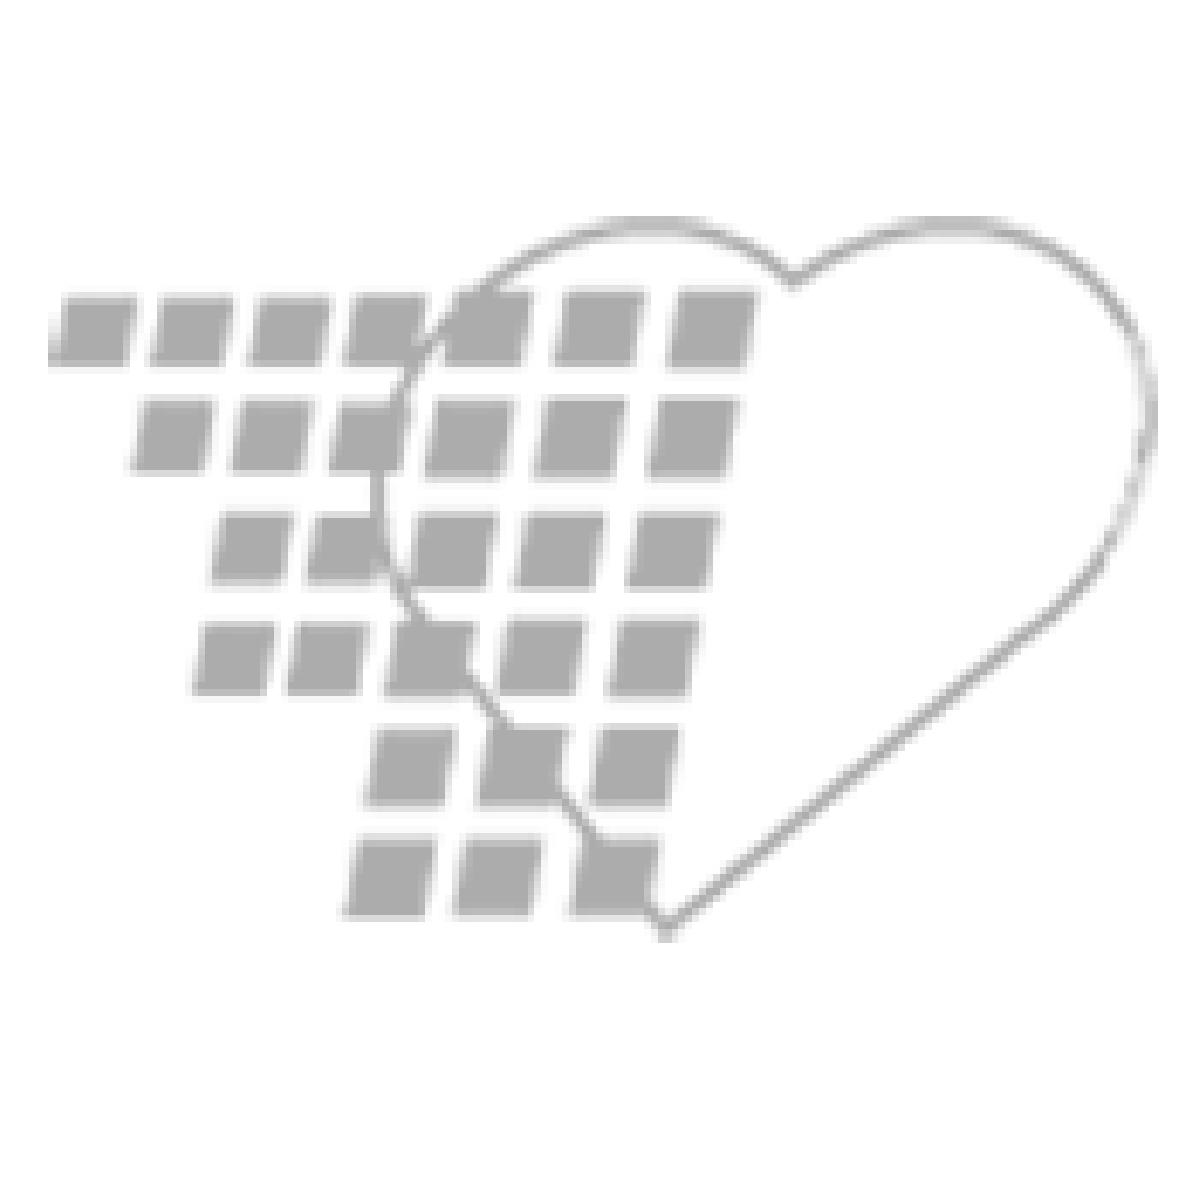 05-92-6252 Pocket Nurse® Wound Measuring Guide